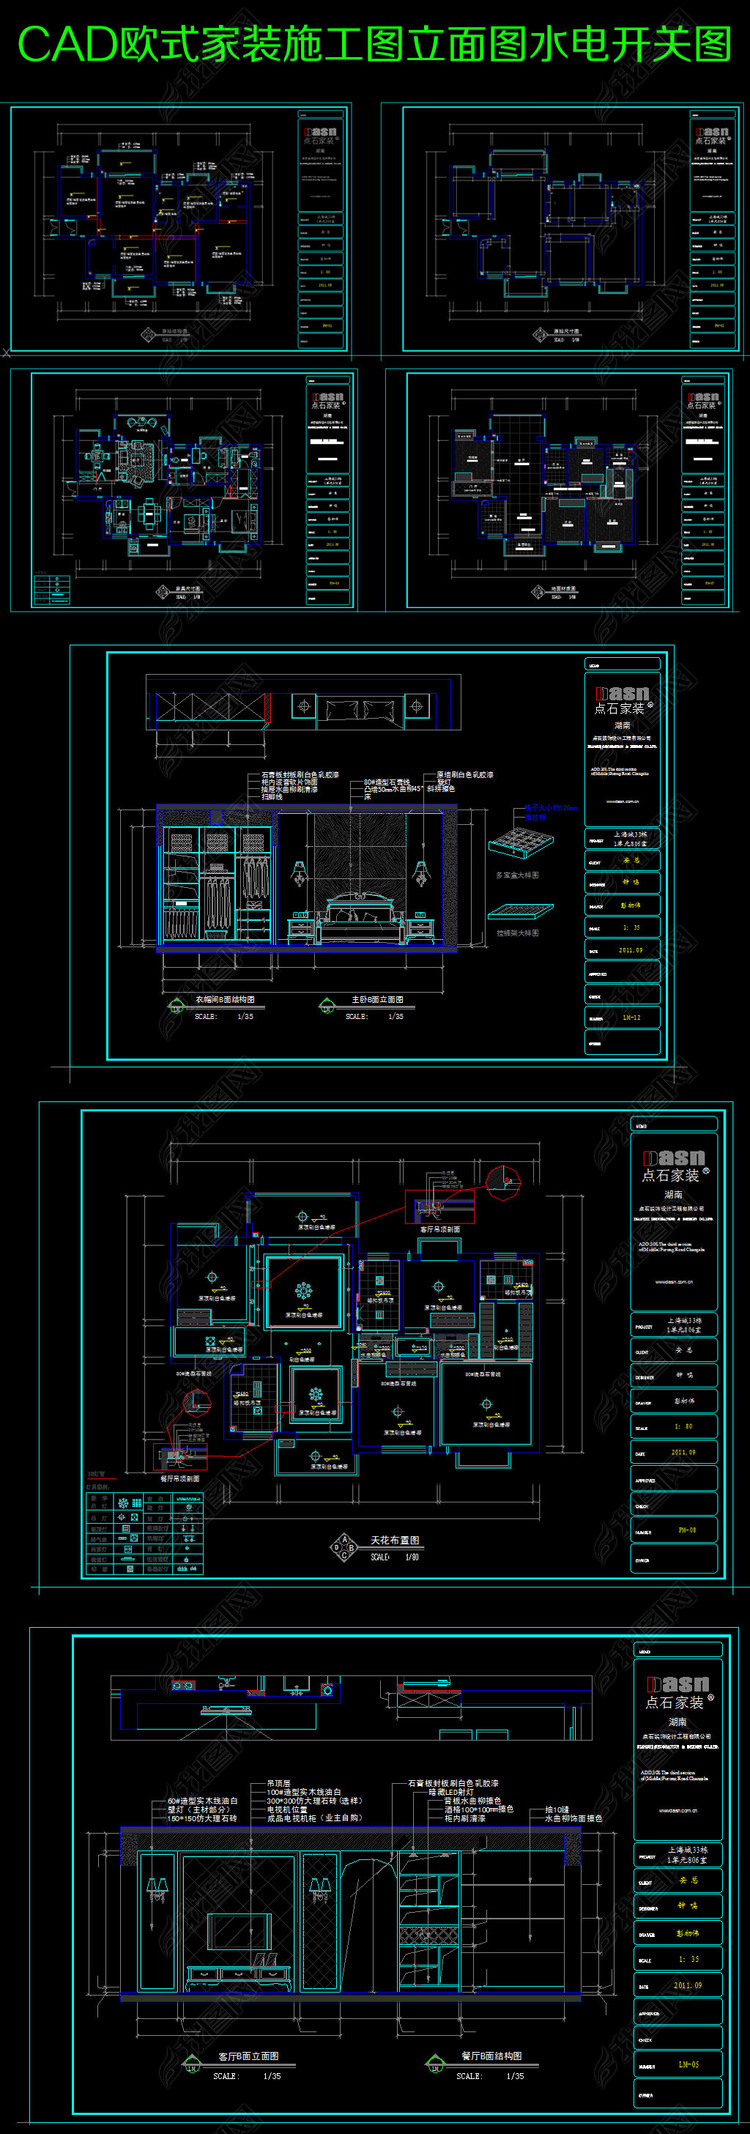 CAD欧式家装施工图立面图水电开关图